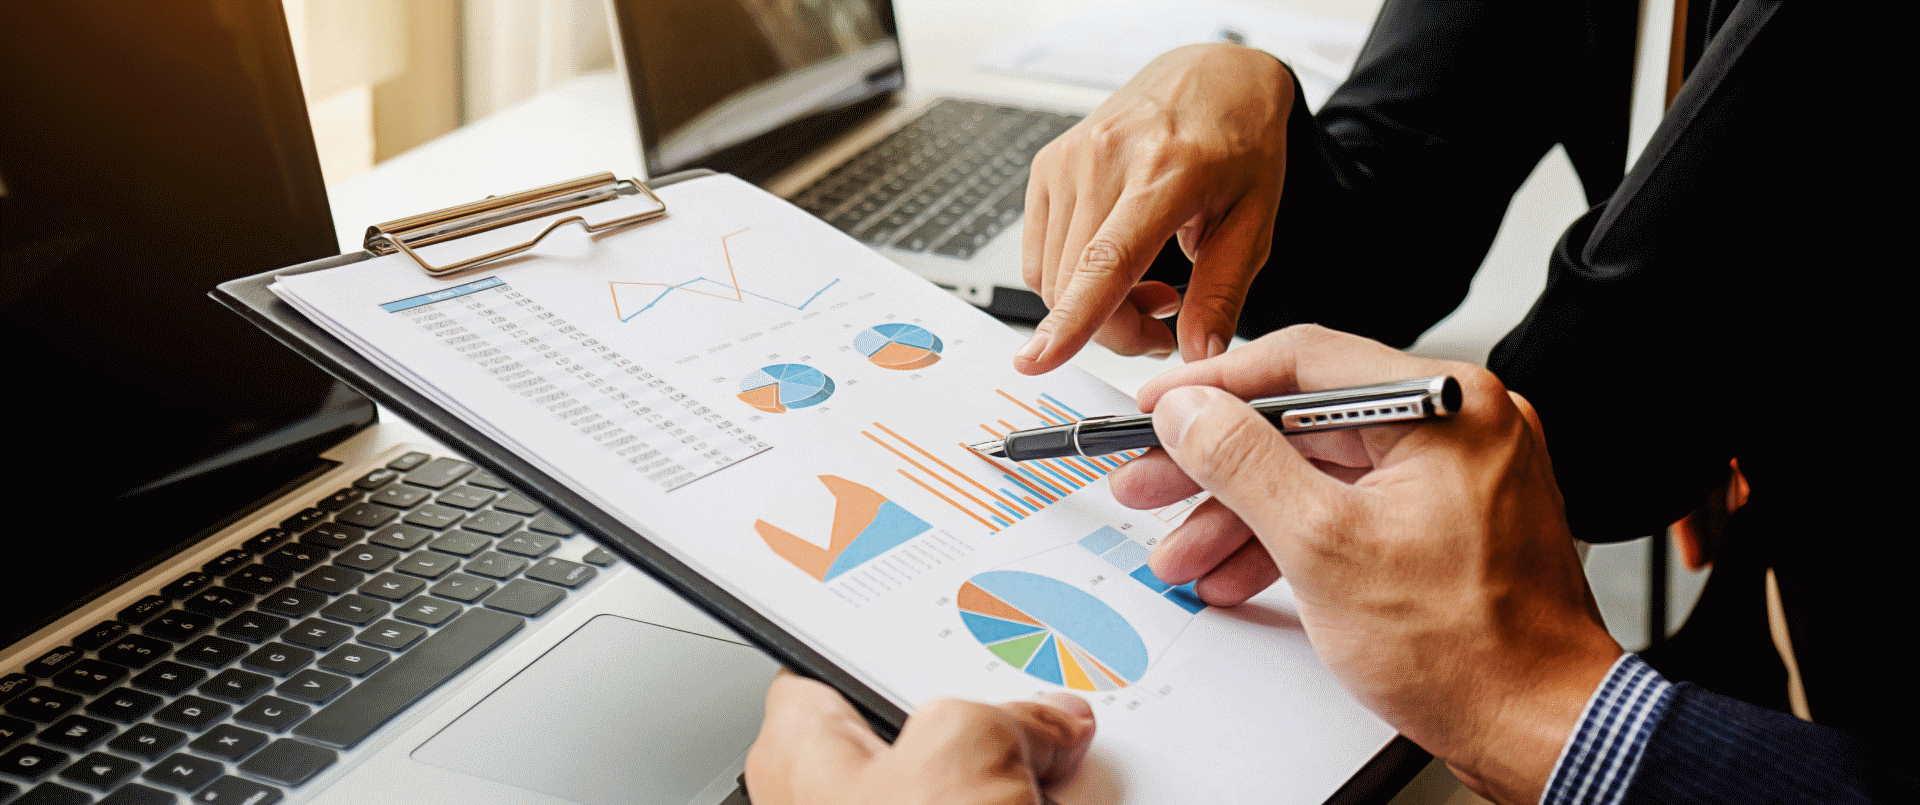 business3 Statistik statistics Nachilfe Tutor tuition Hilfe help aid Problem Hilfe Unterstützung Statistiknachhilfe Statistiktutoring Statistikcoaching Statistikmentoring